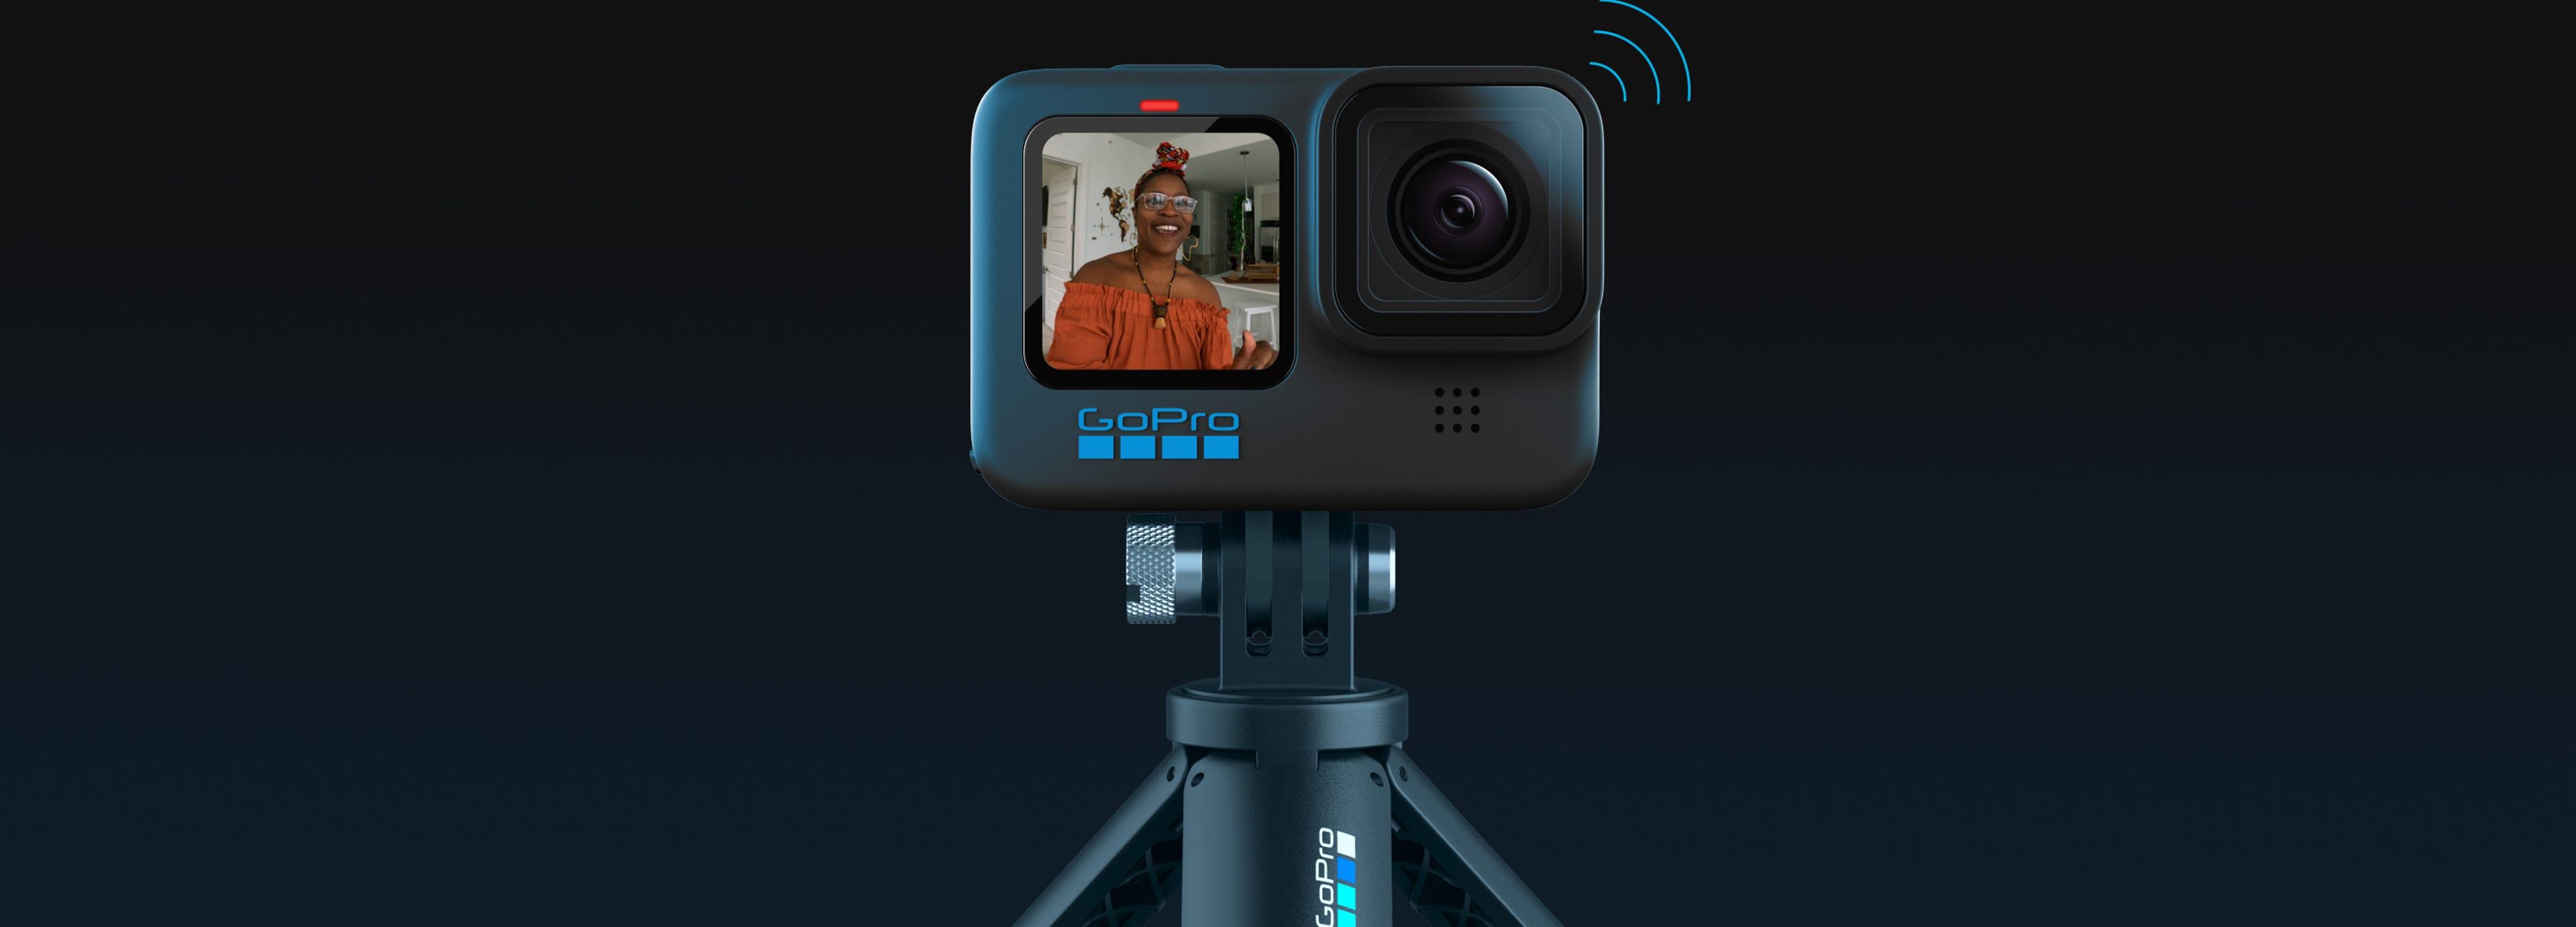 Hero9 Black - Elevate your Webcam